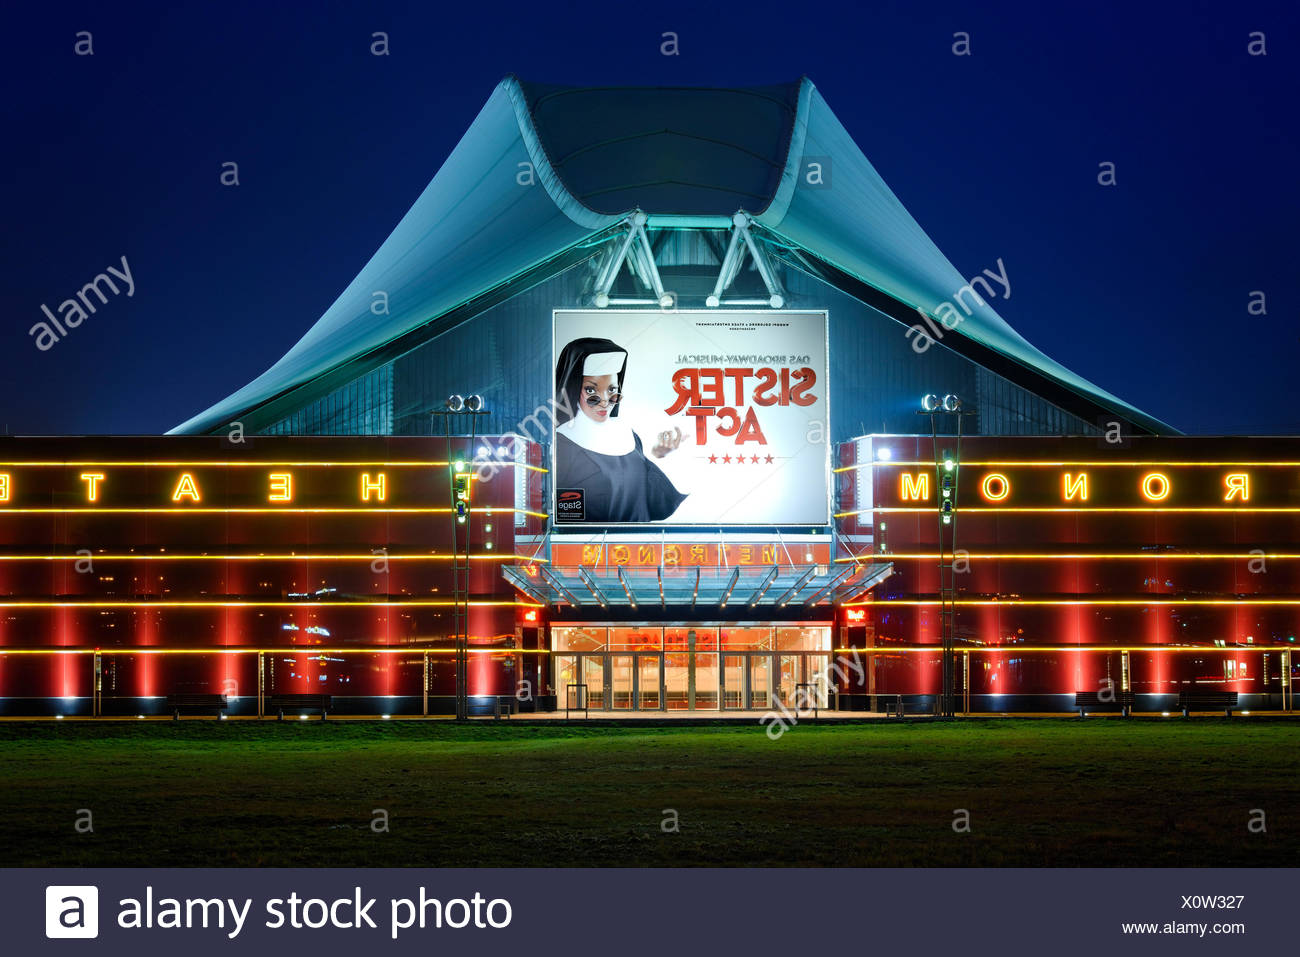 Metronom theatre, Oberhausen, Ruhr area, North Rhine-Westphalia, Germany - Stock Image